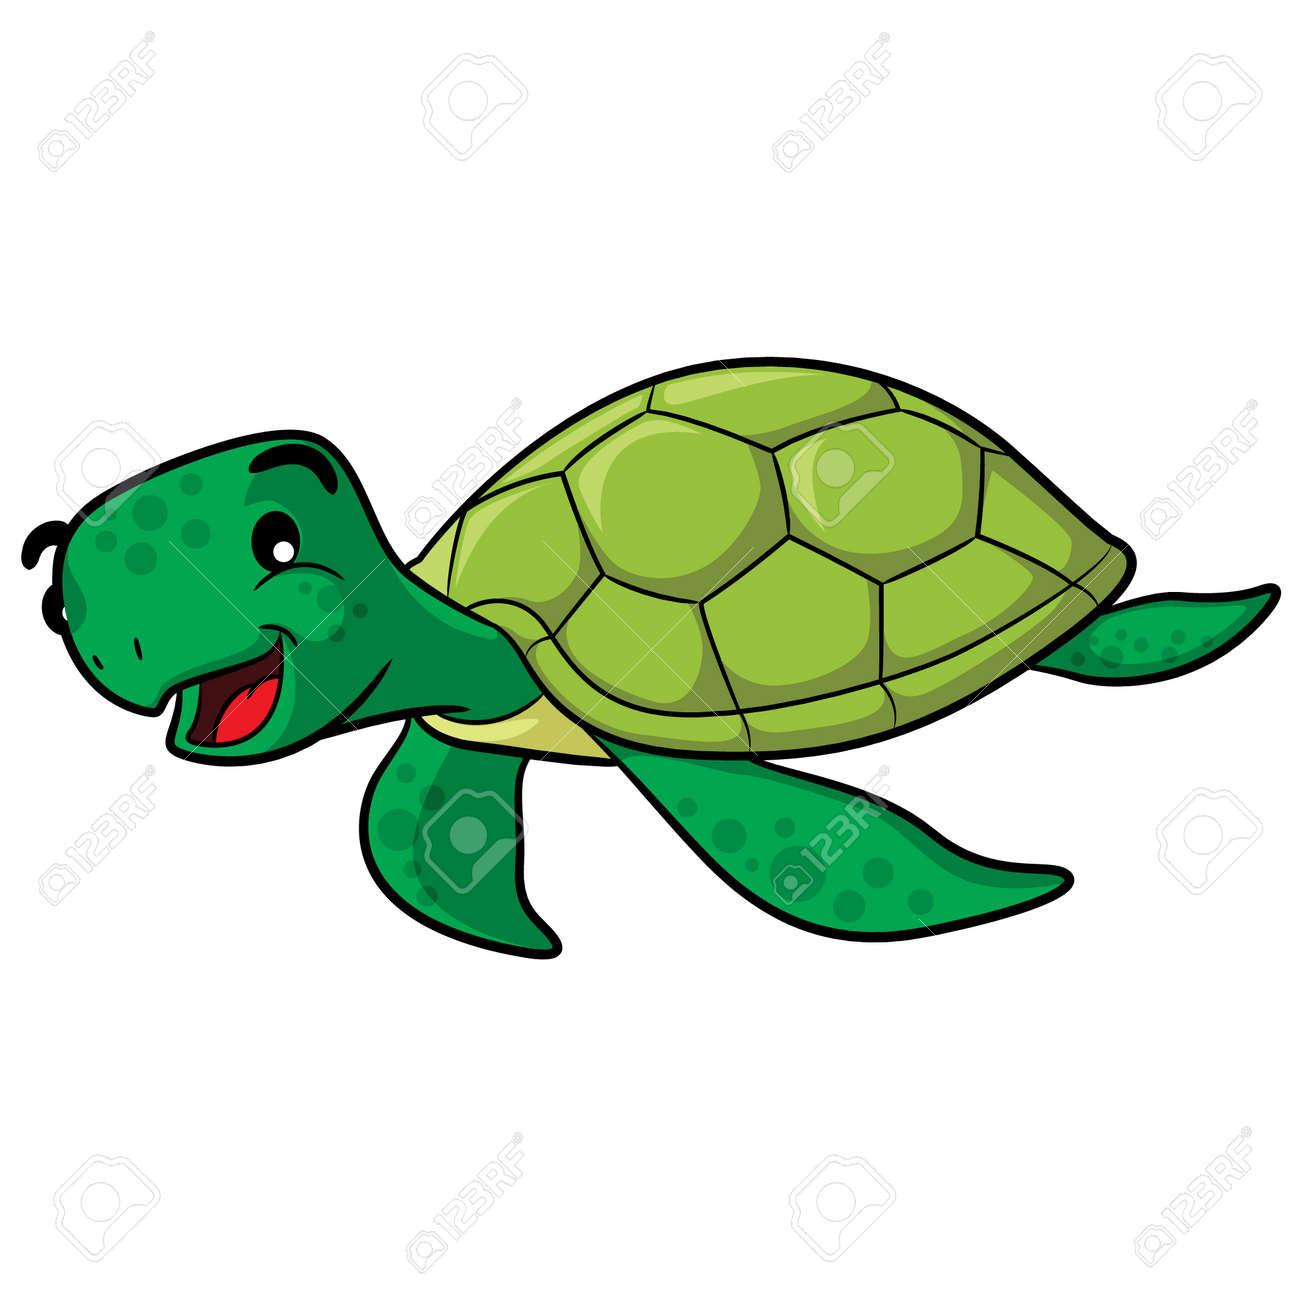 Illustration Of Cute Cartoon Sea Turtle Royalty Free Cliparts